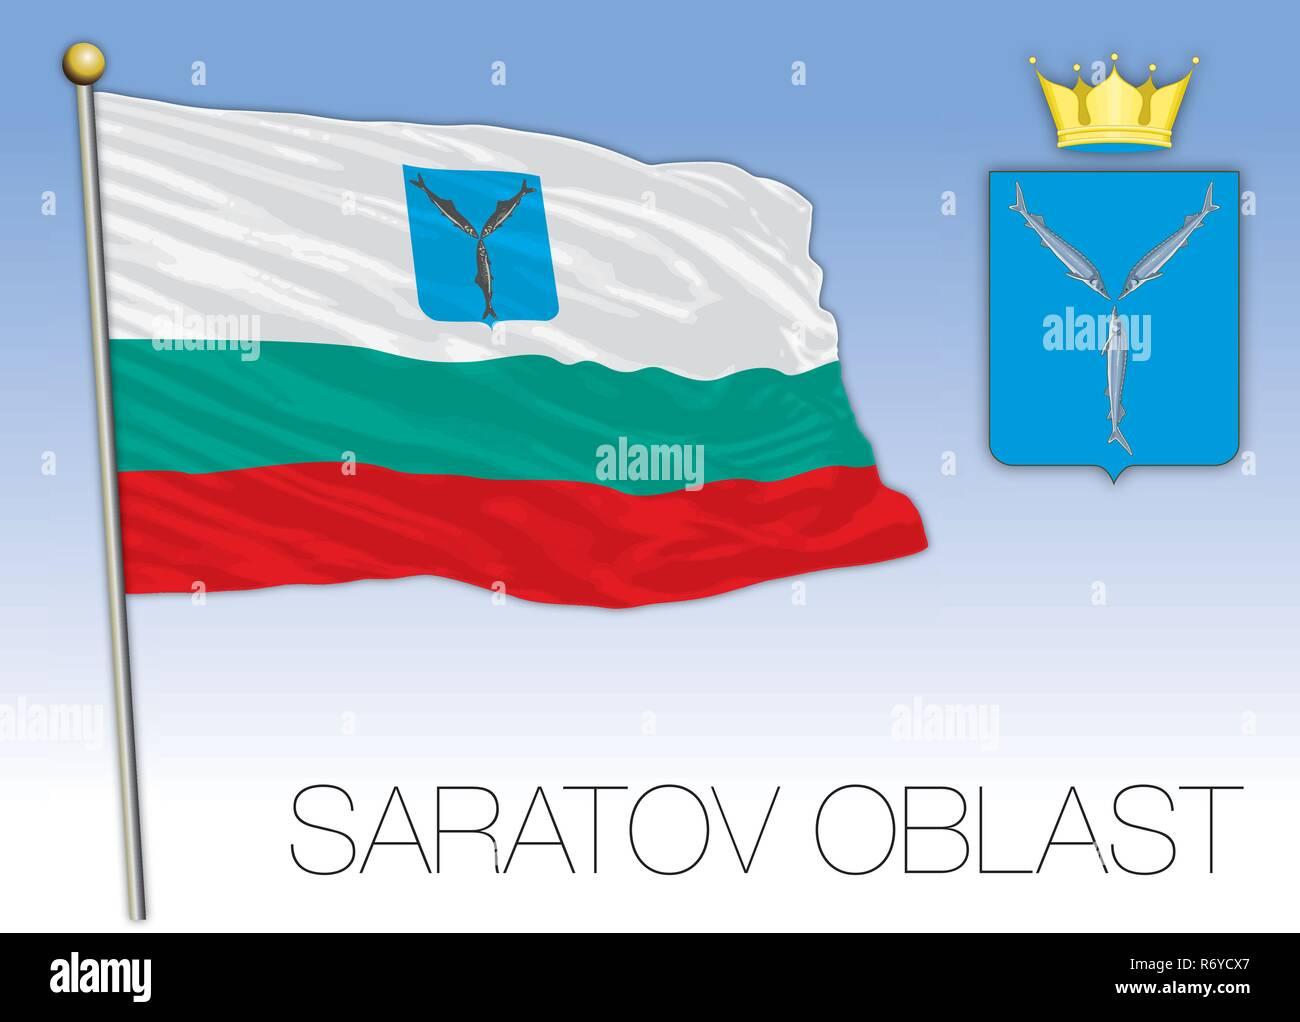 Saratov oblast flag, Russian Federation, vector illustration - Stock Image